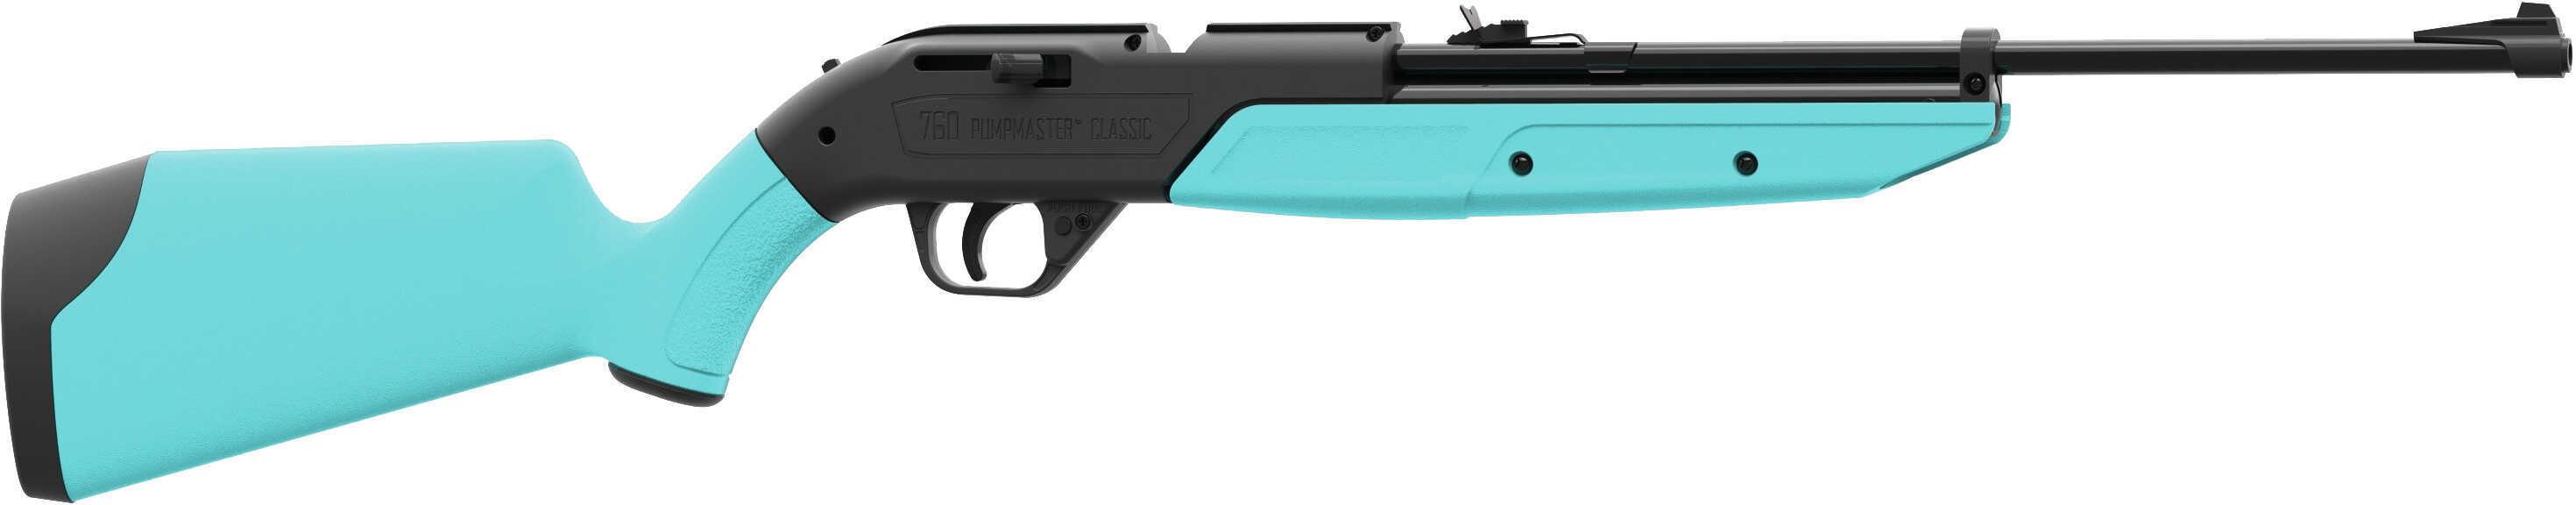 Crosman 760LB 760 Pumpmaster Air Rifle Bolt .177 Pellet/BB 18 Round Synthetic Light Blue Stock Black